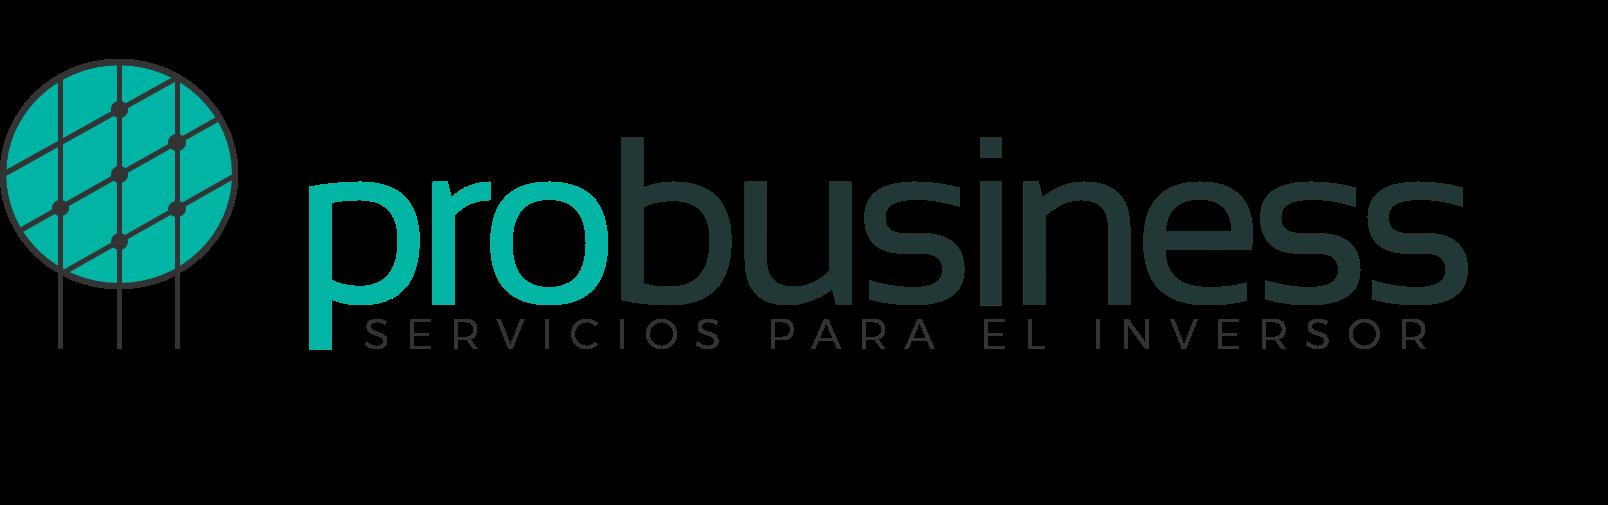 ProBusiness S.A., a chatbot developer